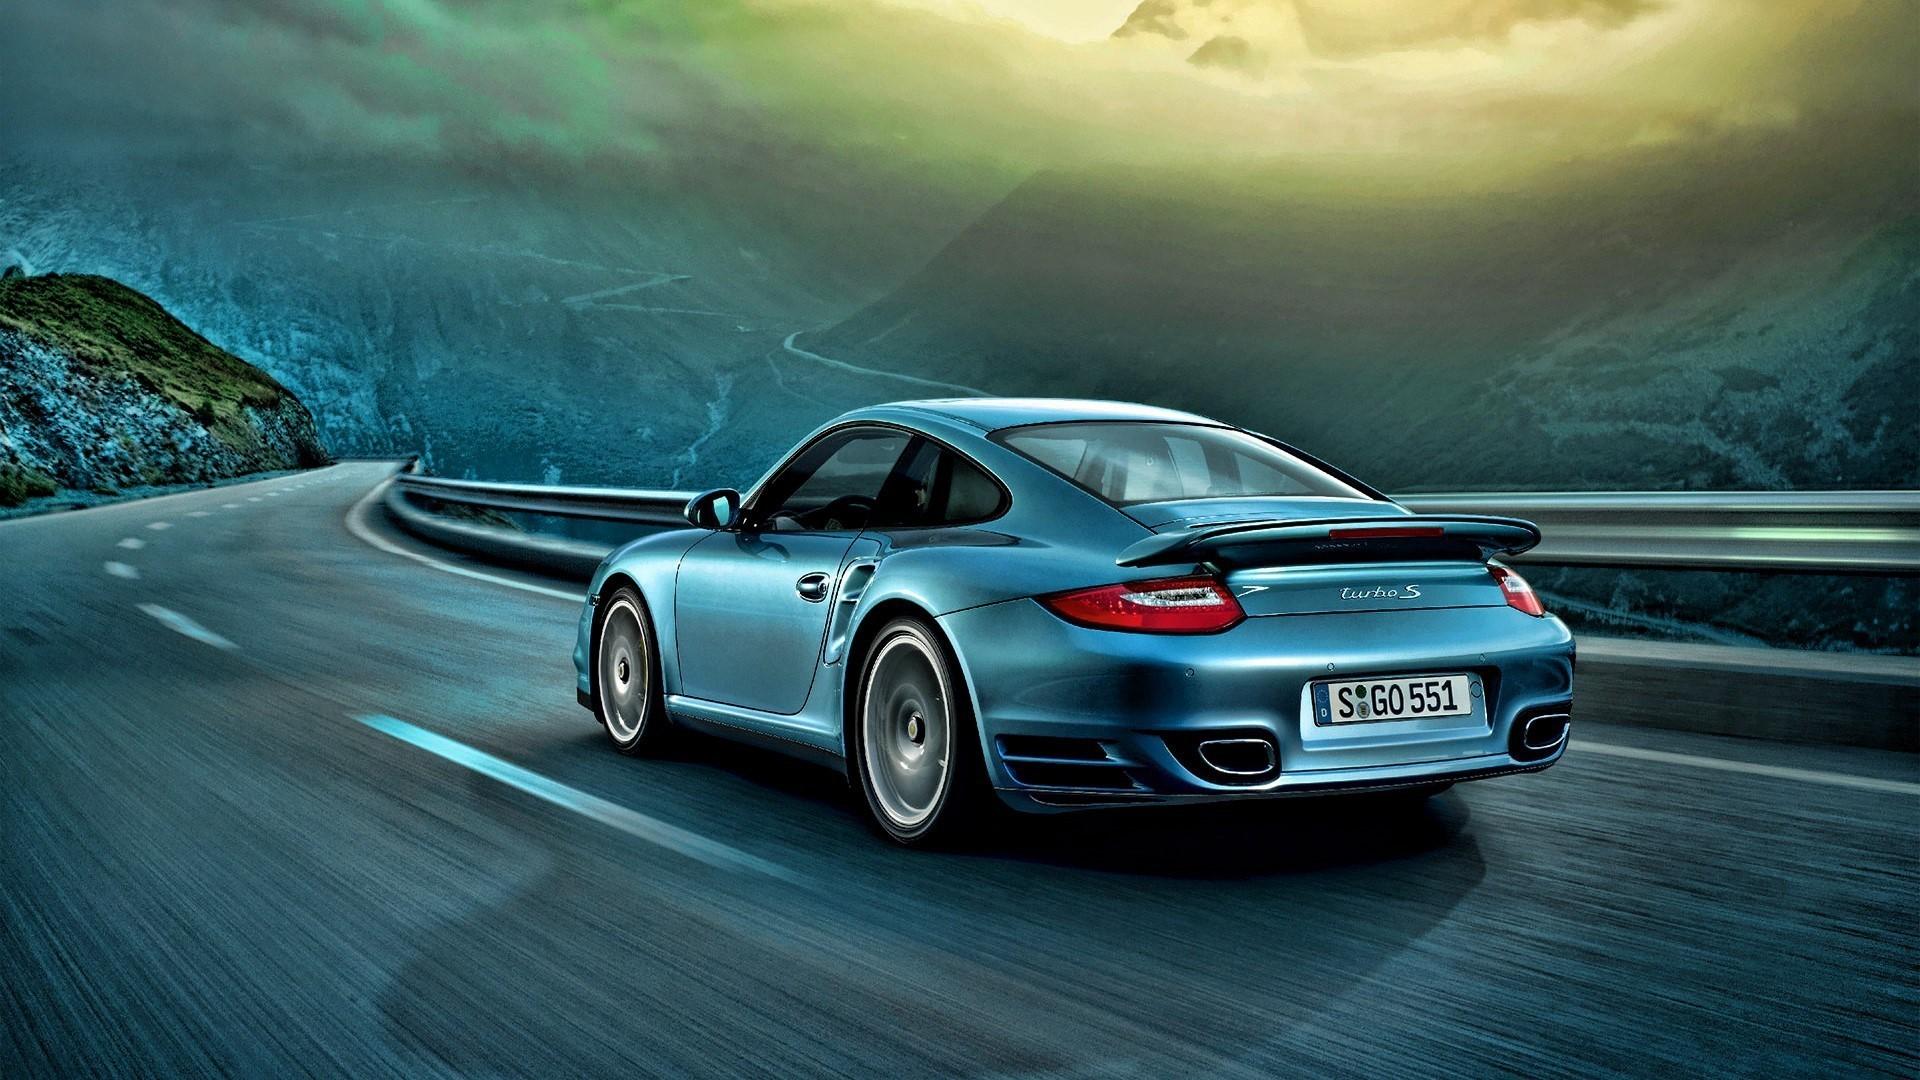 Porsche 911 Turbo Photo